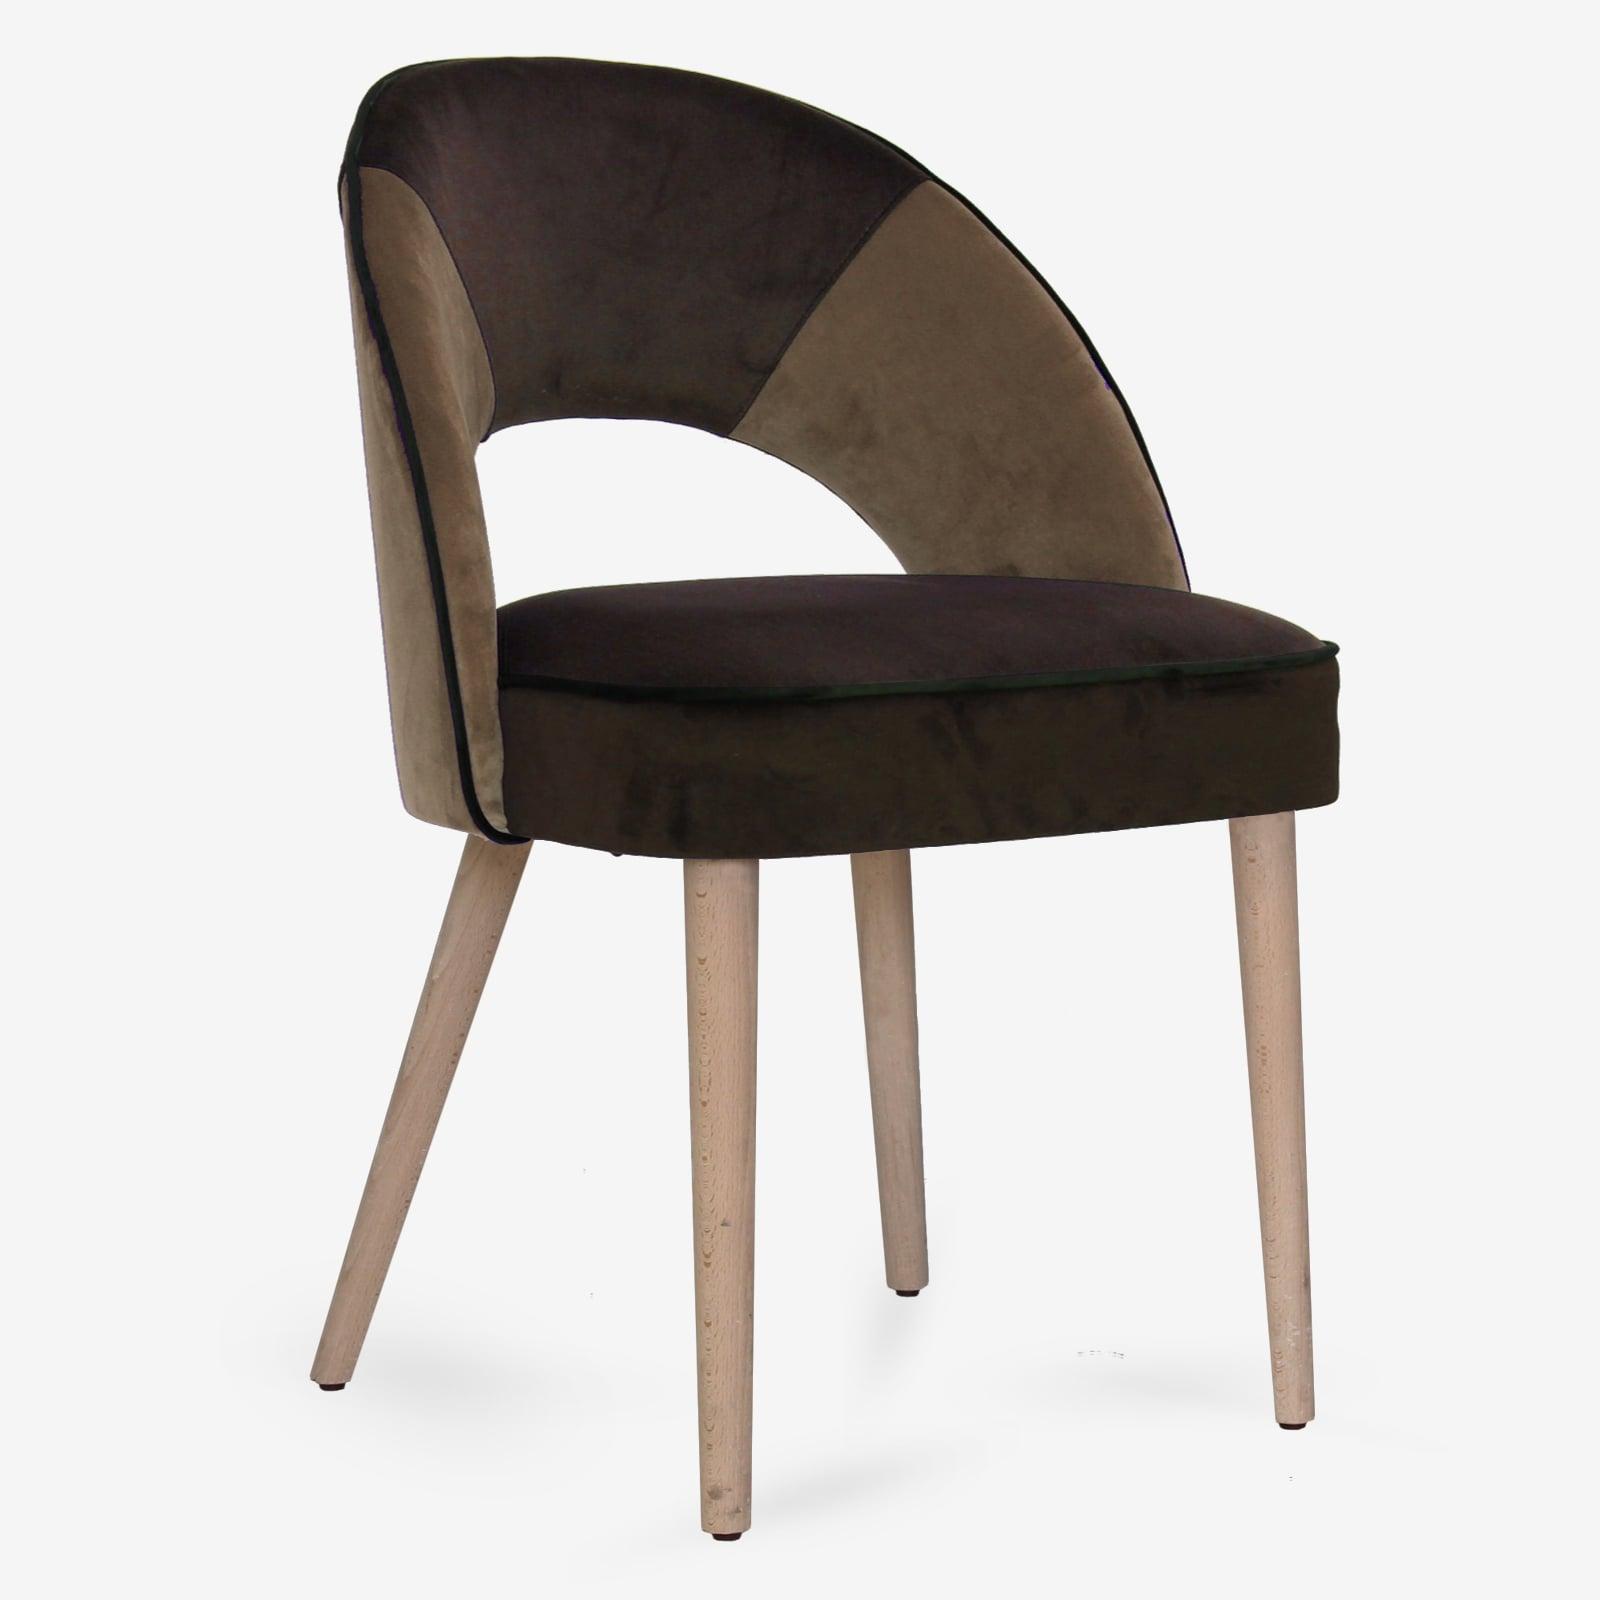 Sedie-in-velluto-sedie-vintage-sedie-moderne-sedie-per-arredamento-contract-sedie-per-ristoranti-alberghi-hotel-agriturismi-uffici-negozi-marr-gc-l